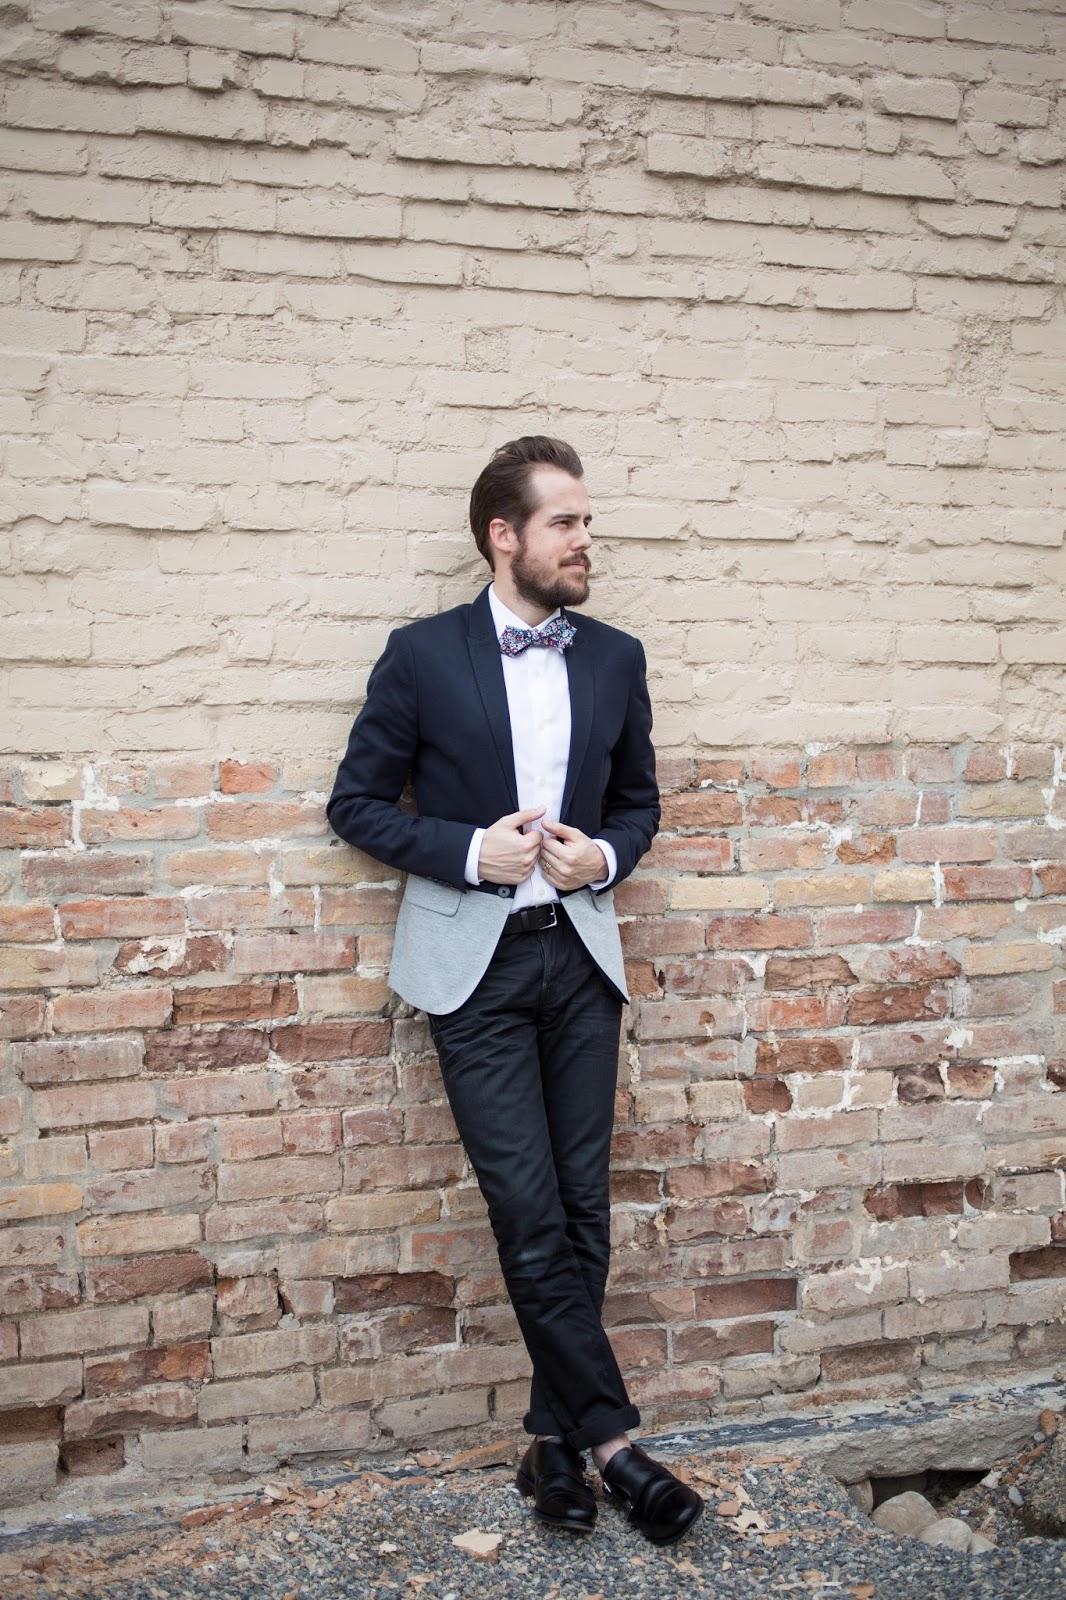 Menswear Weekend Causal Bow-tie Zara color block blazer All Saints denim